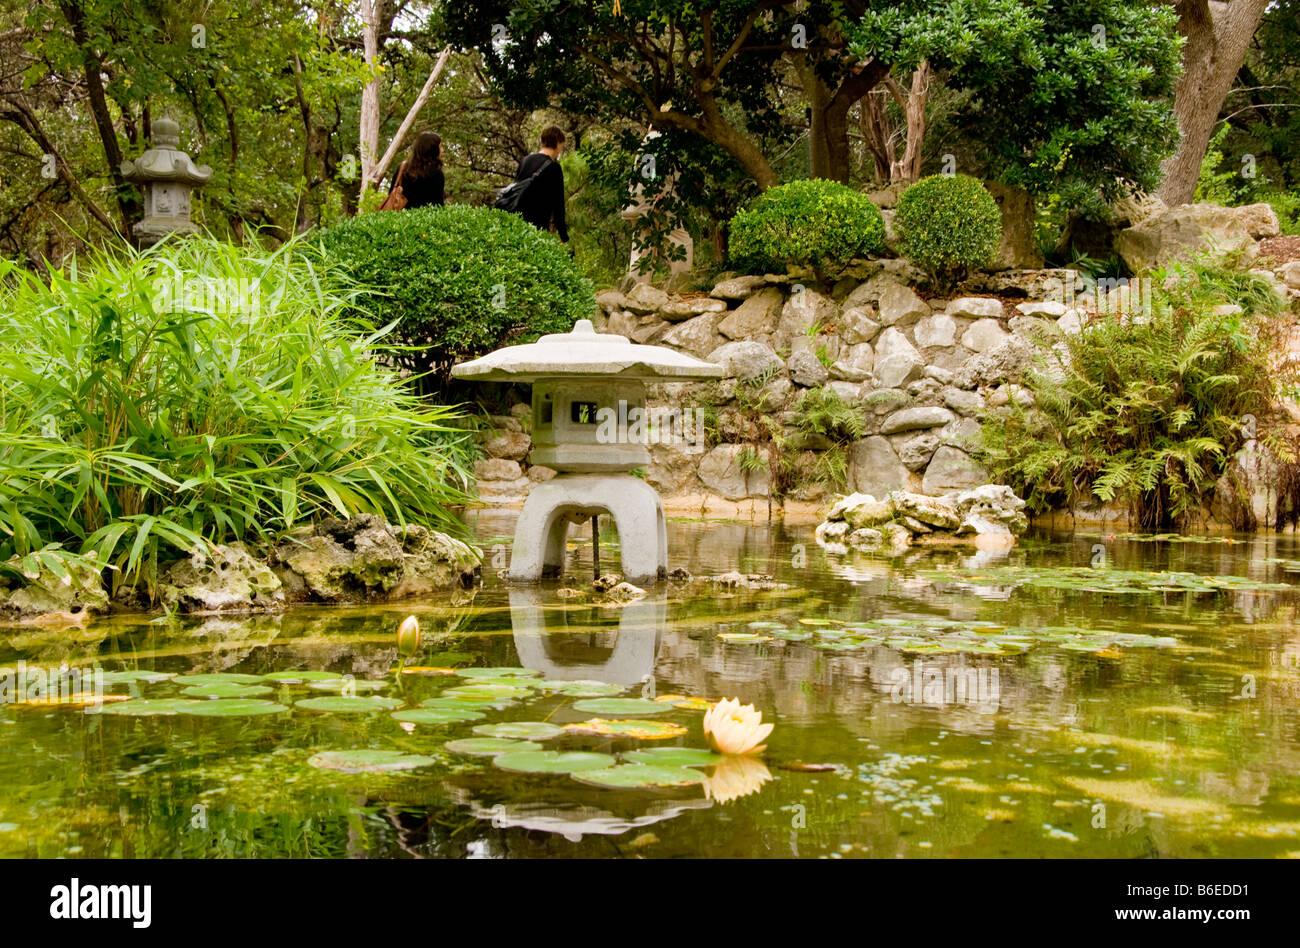 austins zilker park botanical gardens japanese koi pond